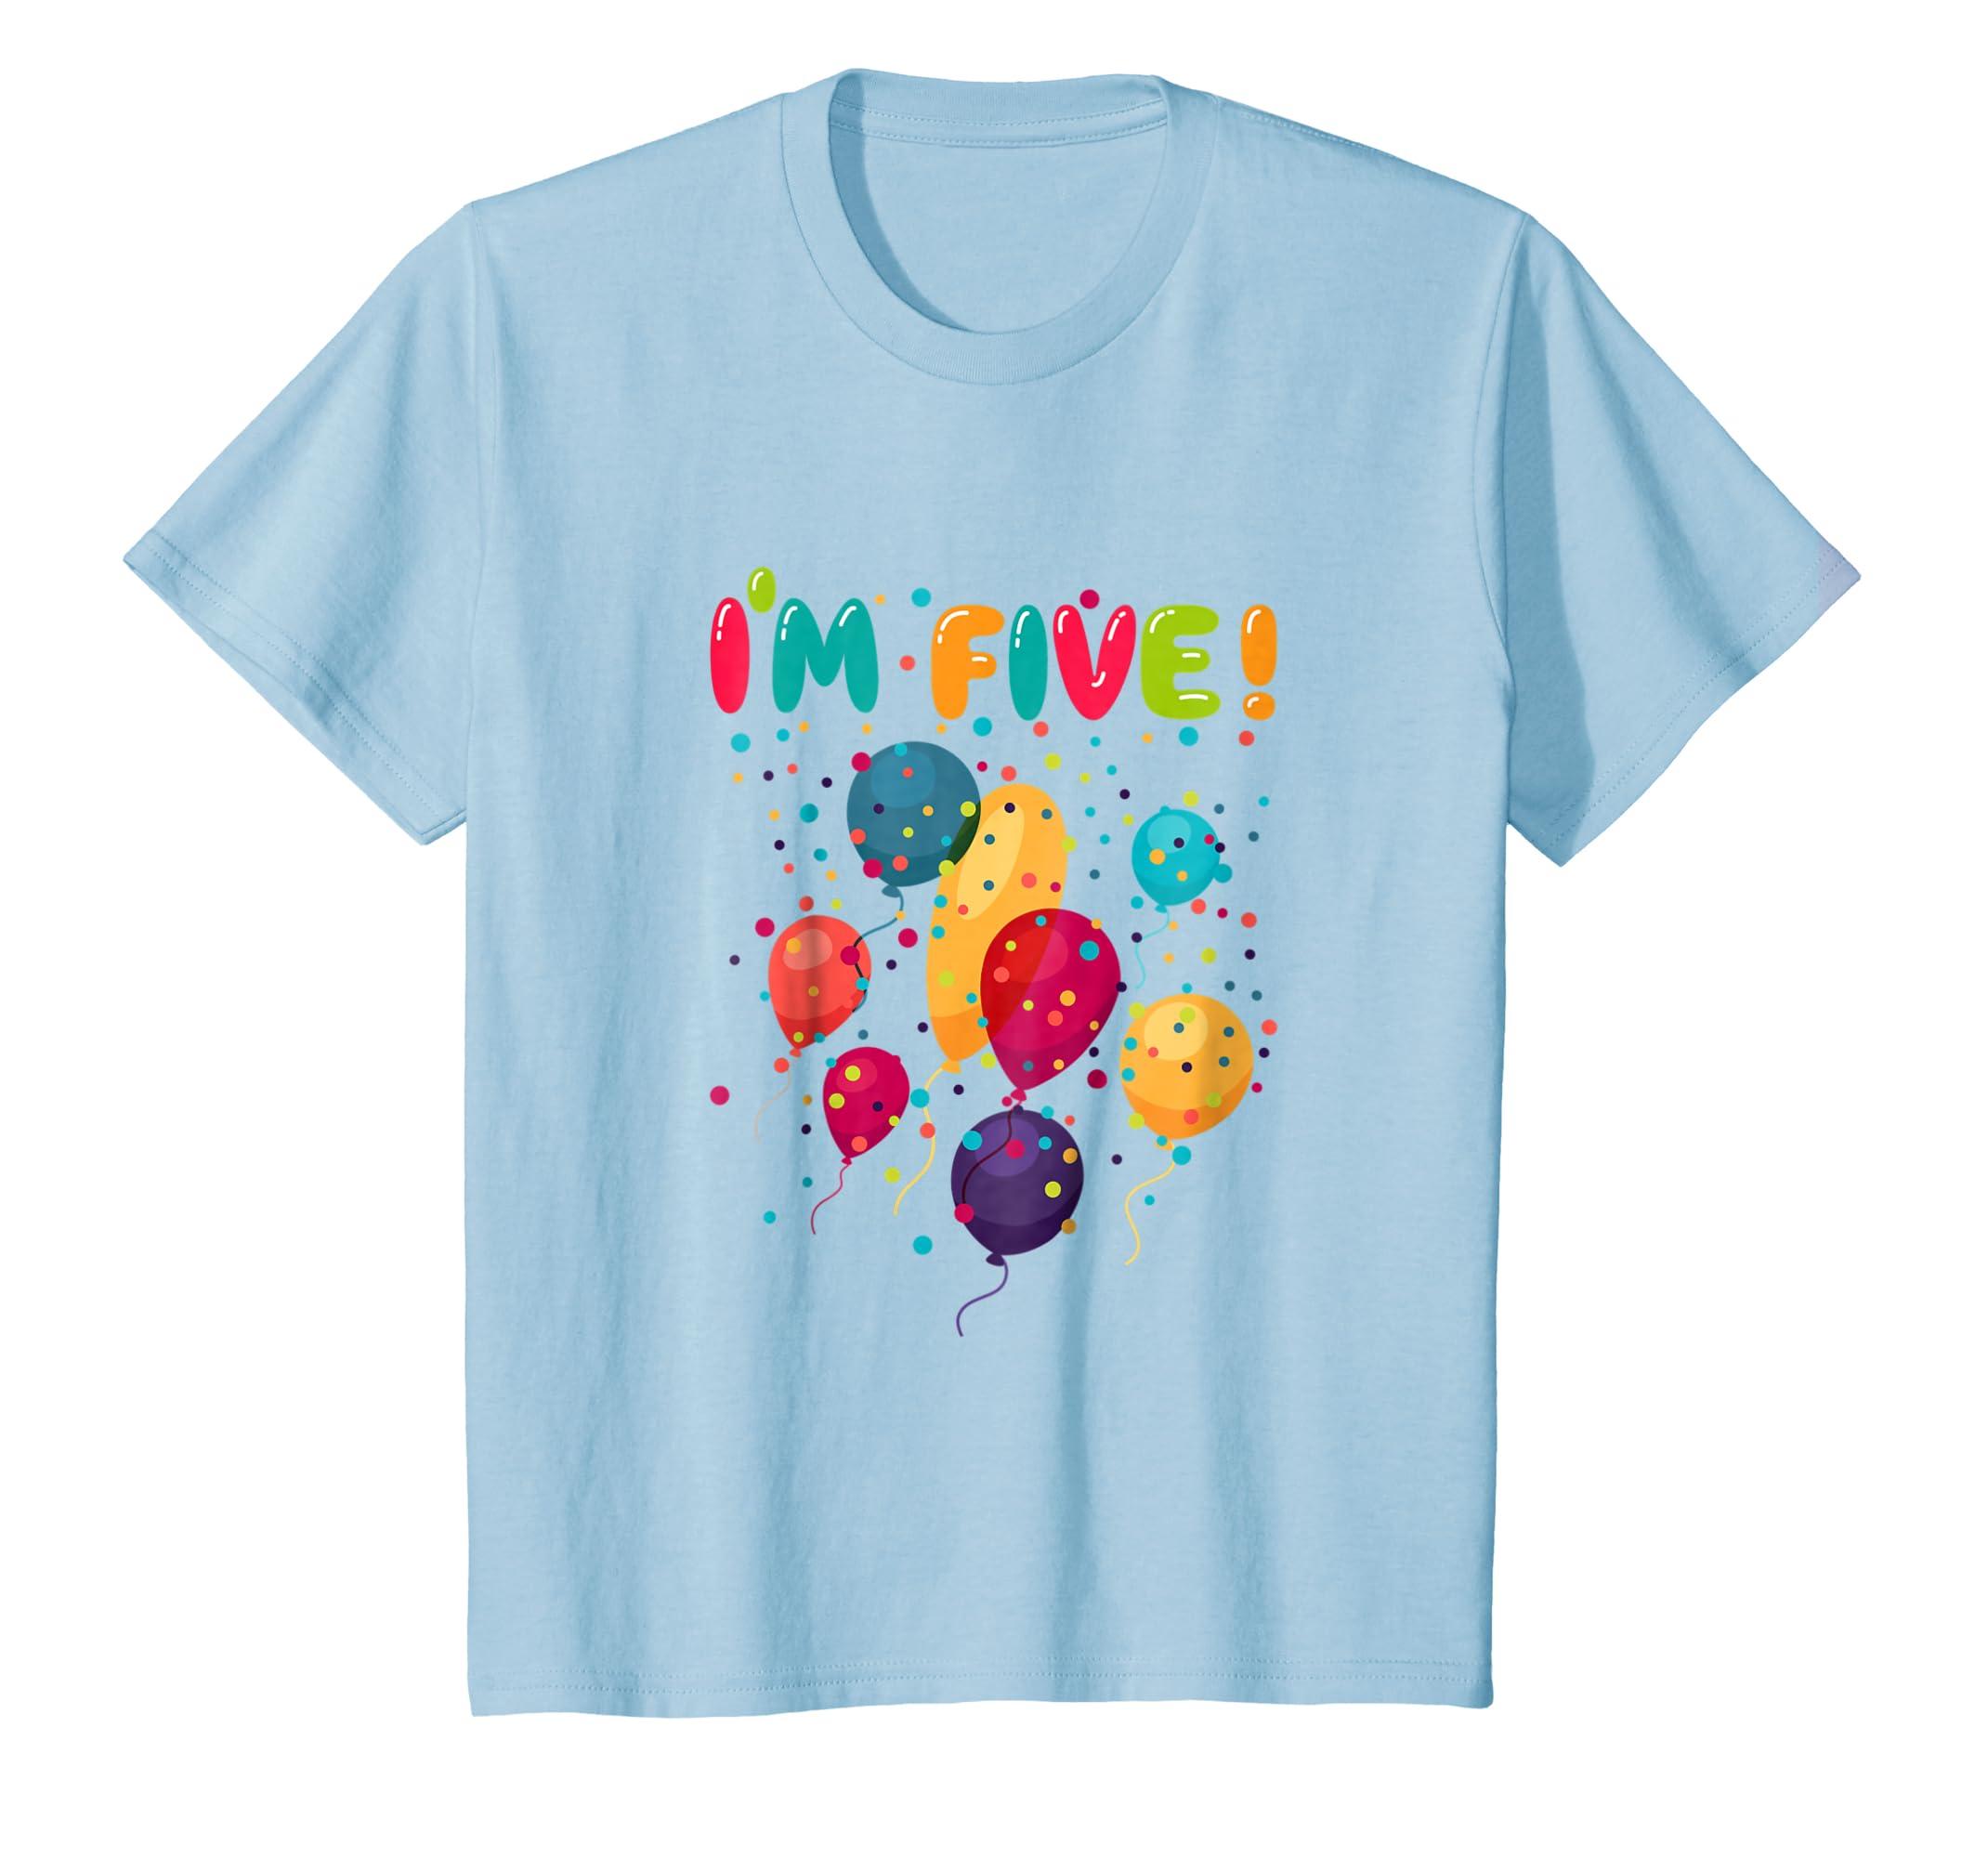 Amazon Kids Happy 5 Fifth Birthday Party Balloons T Shirt Clothing